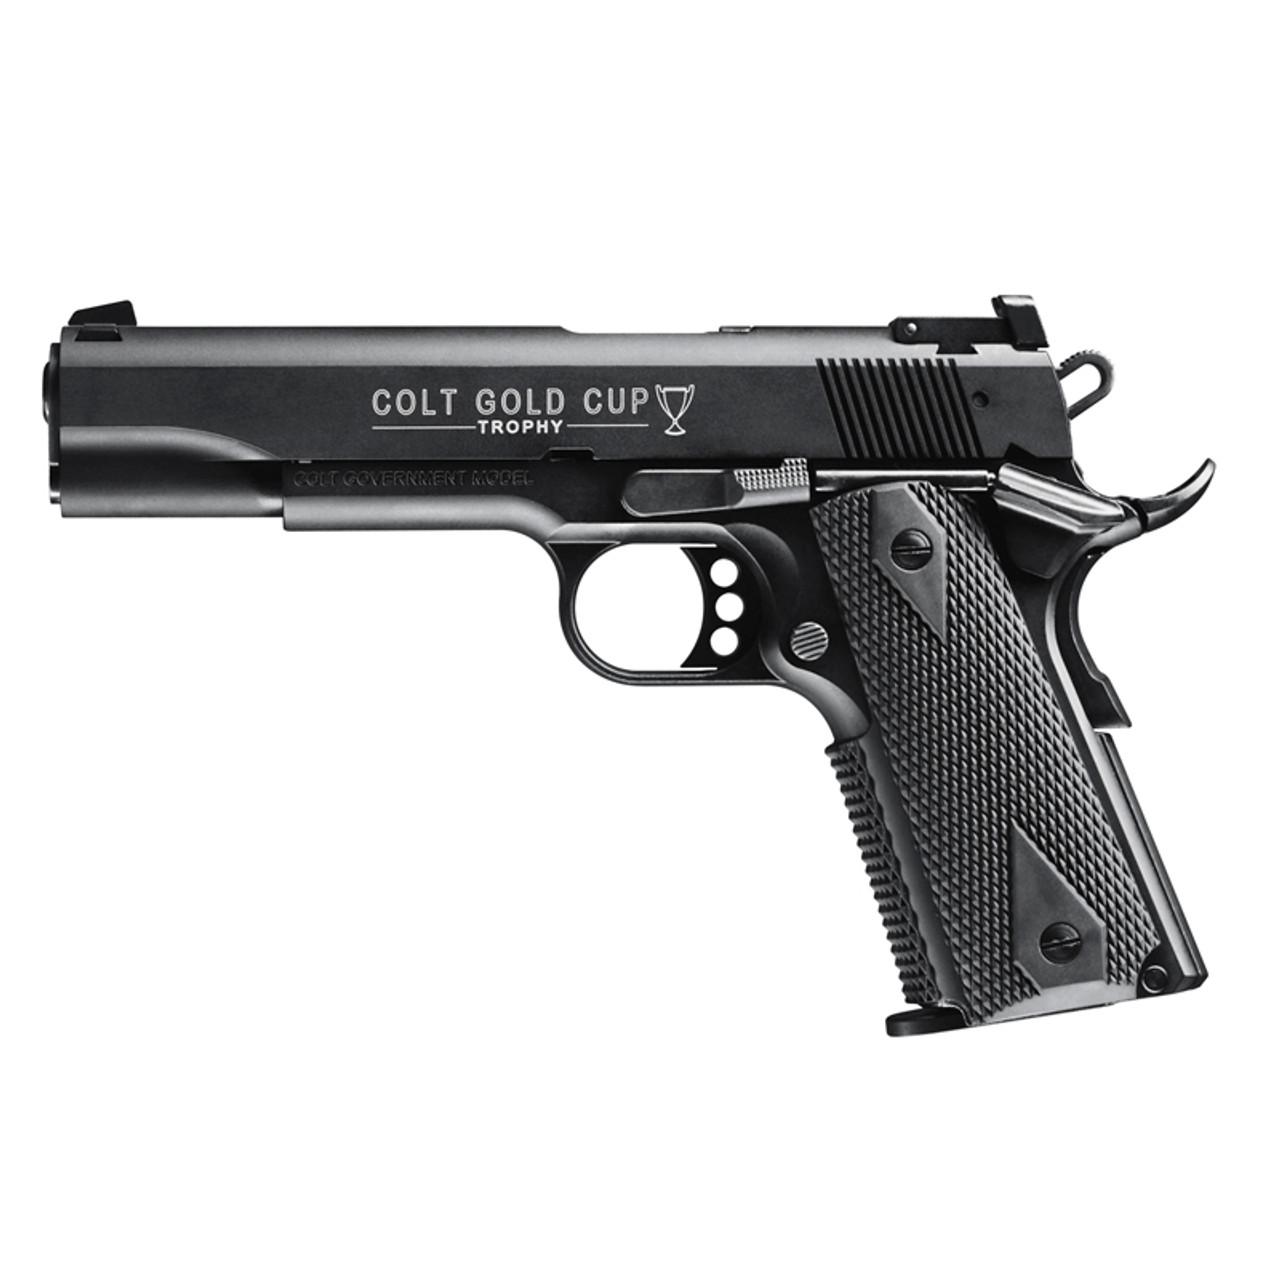 Colt 1911 A1 Gold Cup .22LR